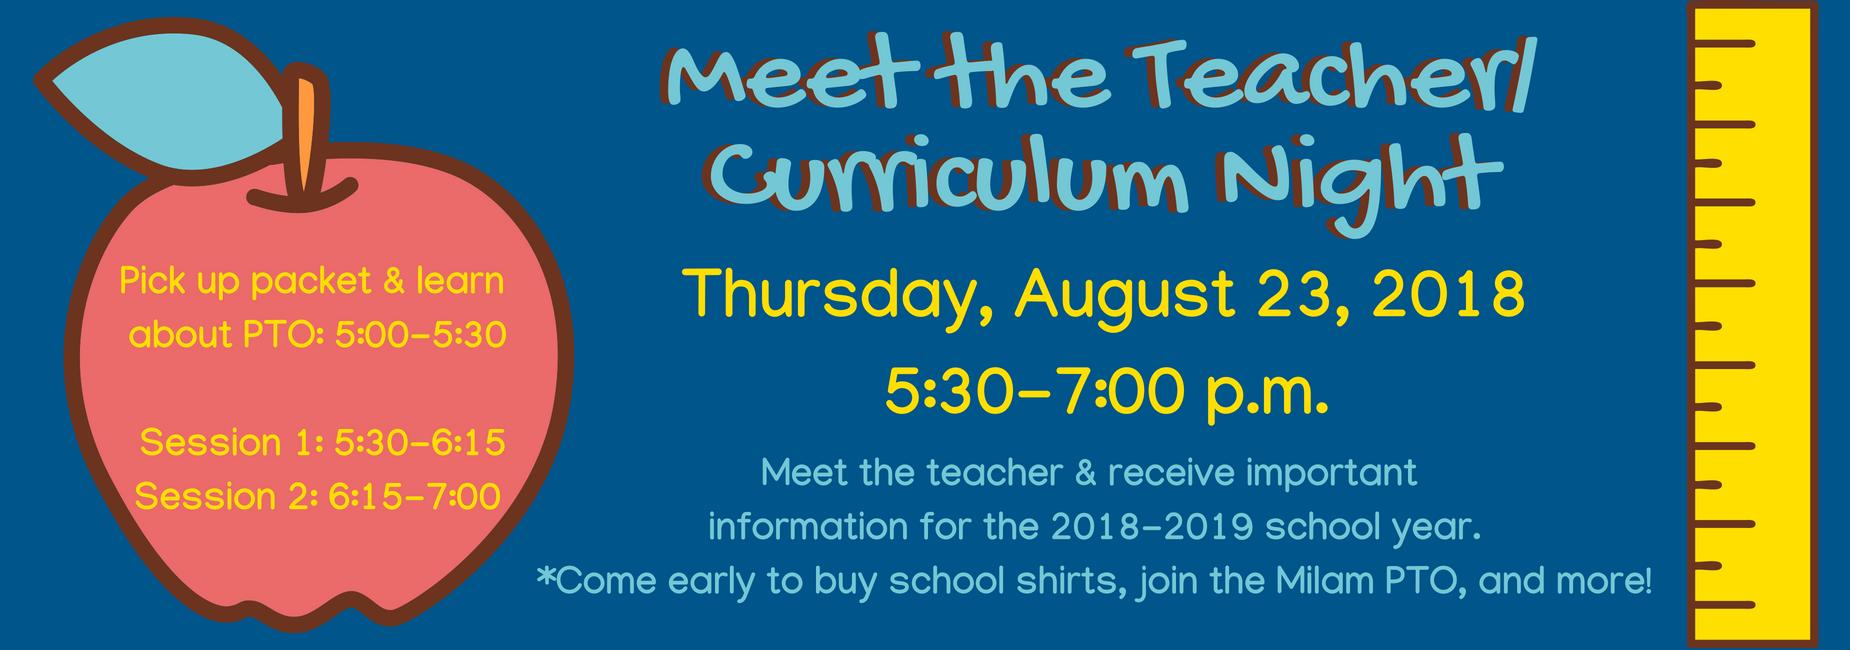 Revised Meet the Teacher Night Information